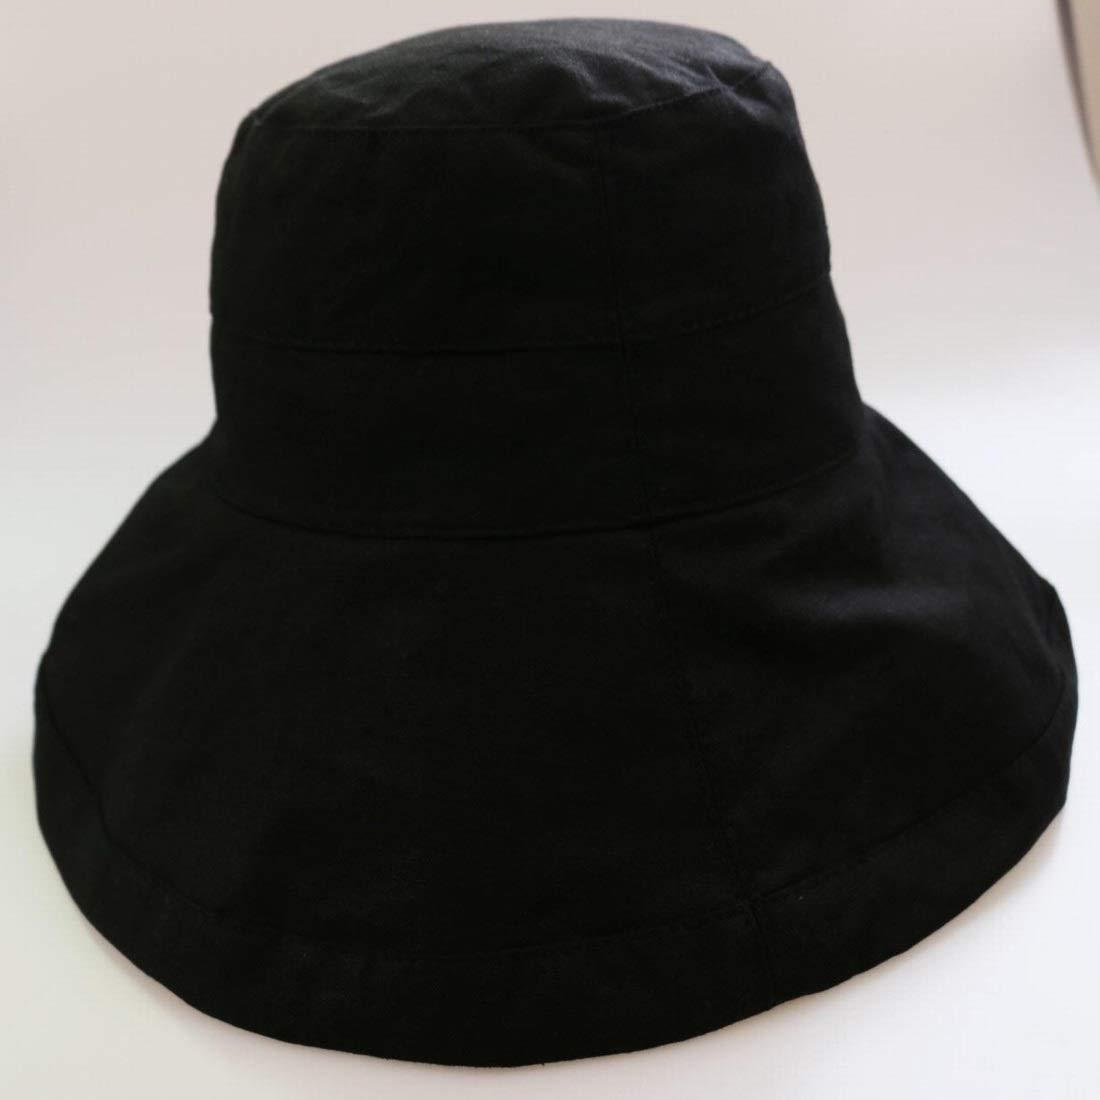 Sixminyo Sombrero de Pescador Plegable de ala Ancha de ala Ancha de algodón Sombrero de Pescador Plegable (Color : Black)